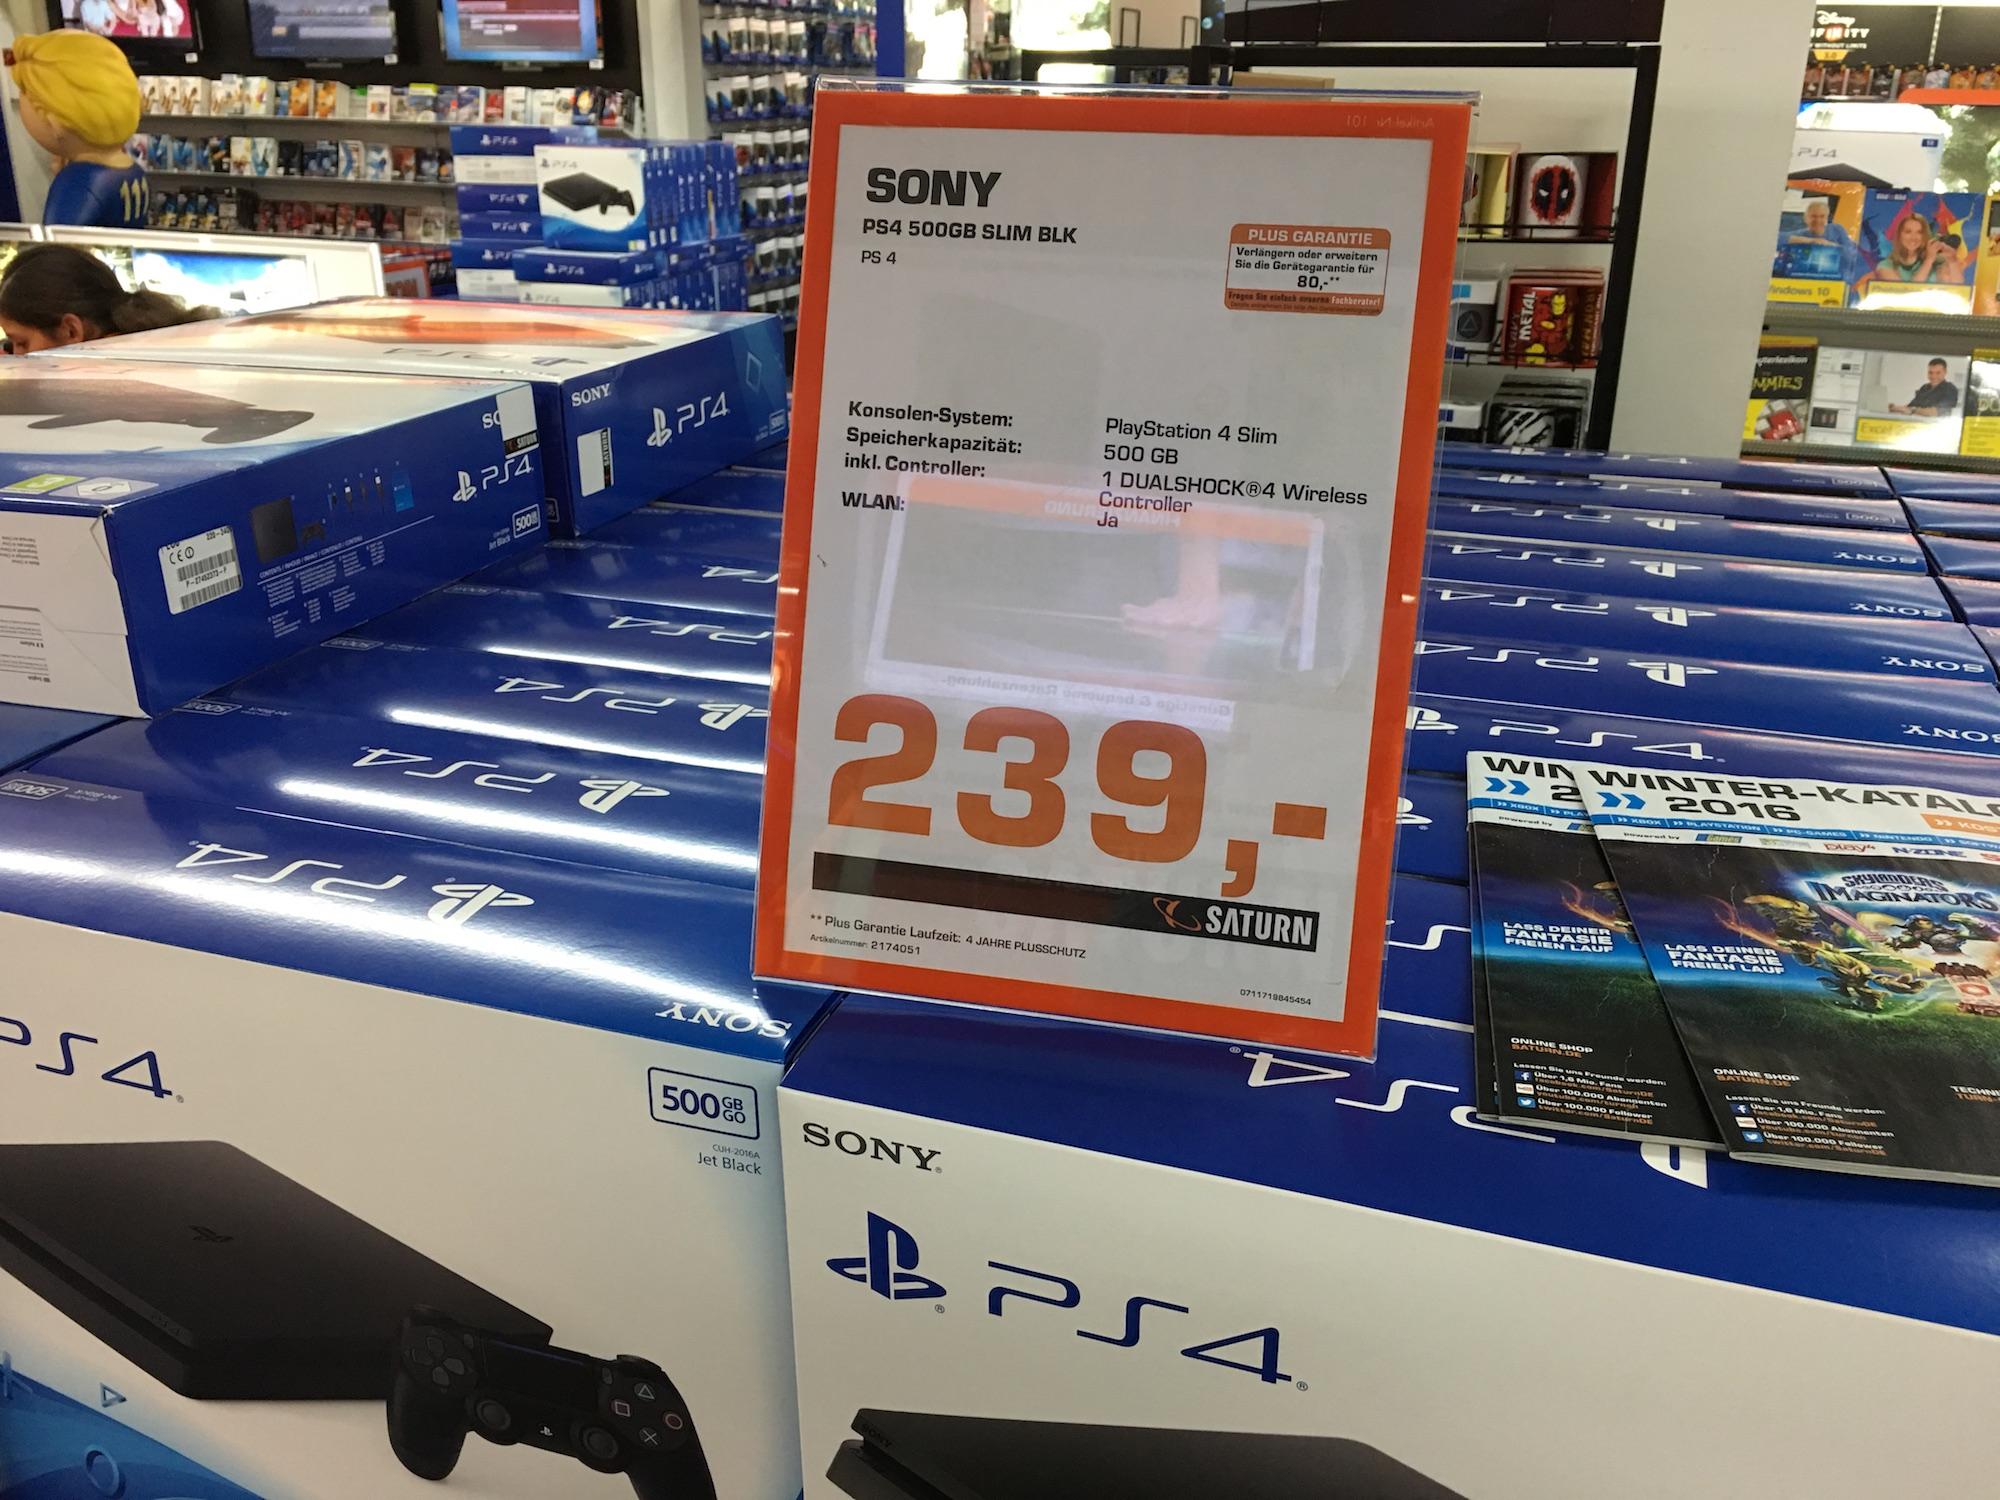 [LOKAL Saturn Köln Hansaring] Sony Playstation 4 Slim 500GB für 239€